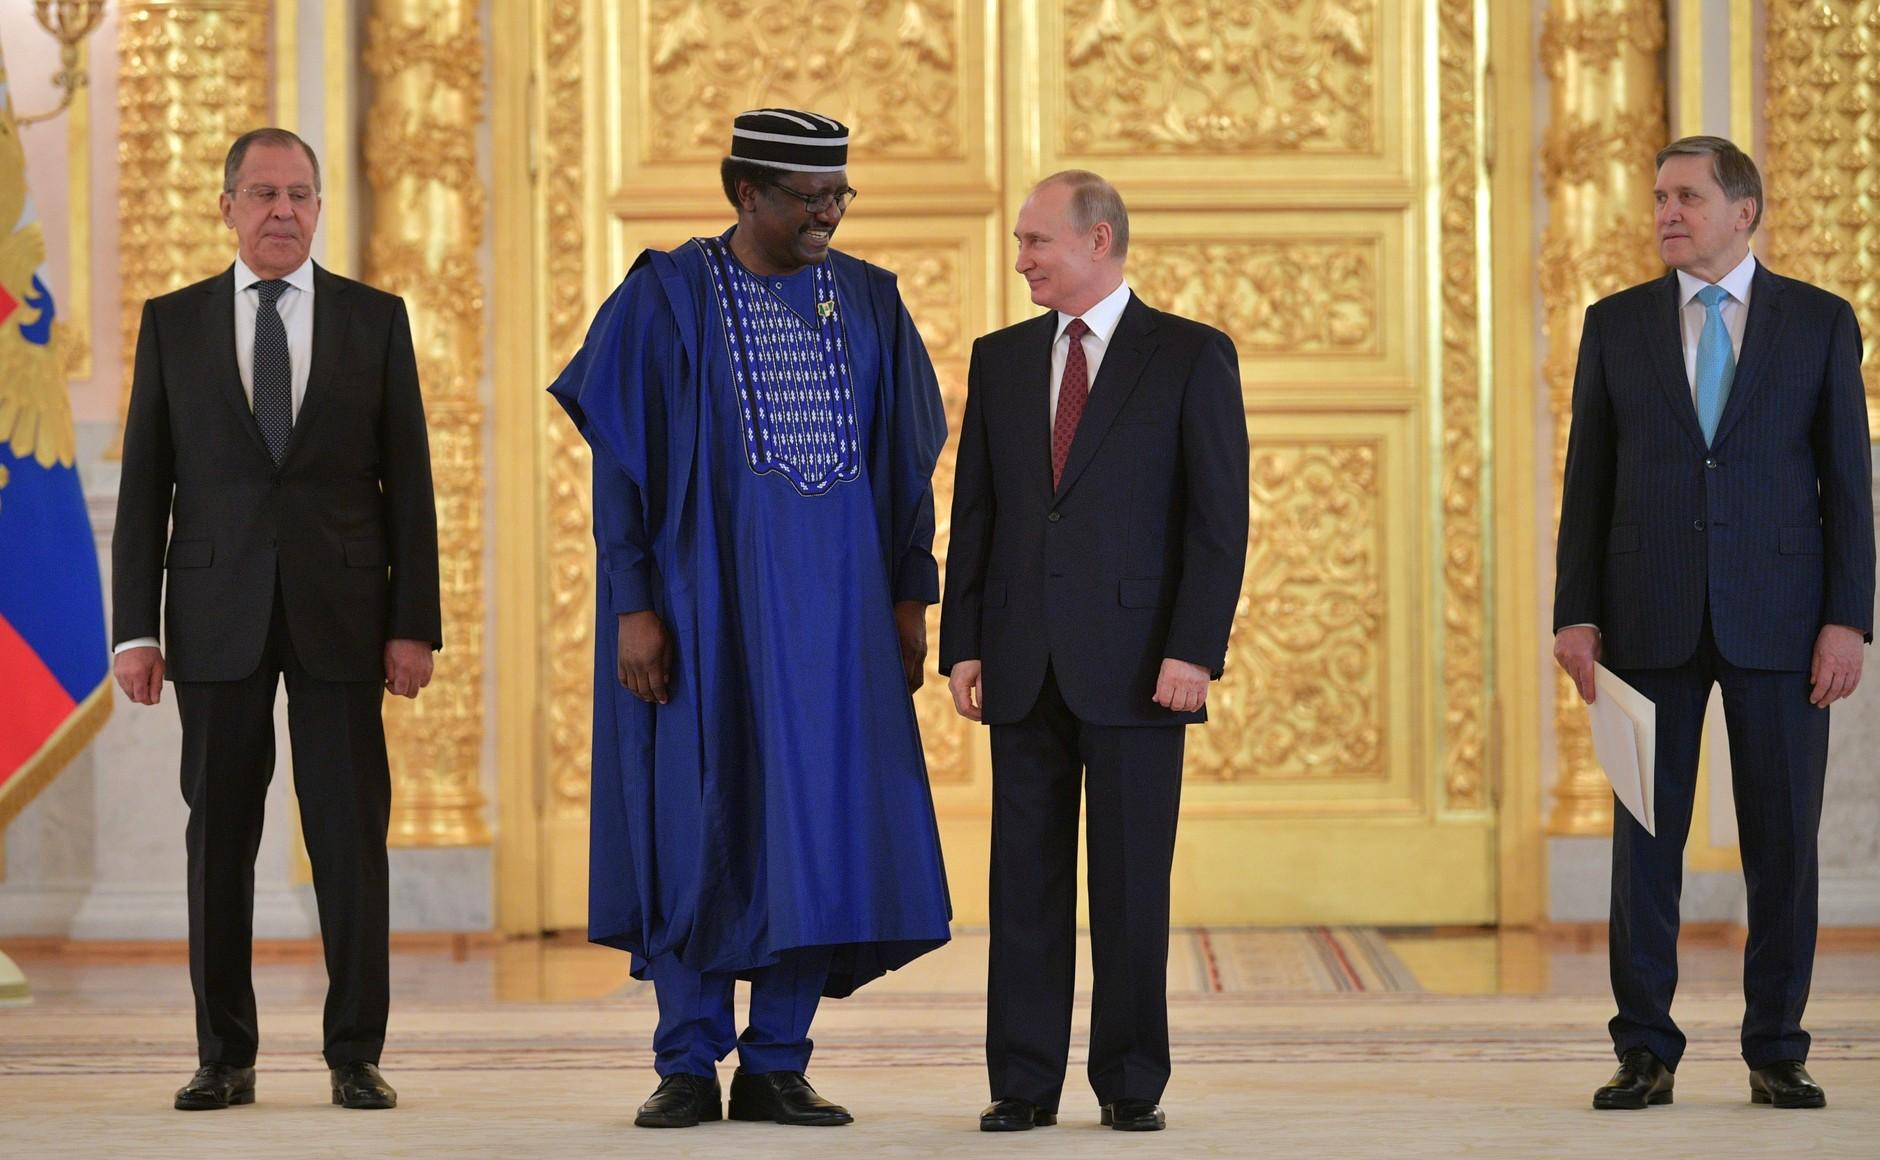 Professor Steve Davies Ugba Vladimir Putin - Sochi 2019: Afreximbank says Russia-Africa trade volume hits N20bn in 3 years